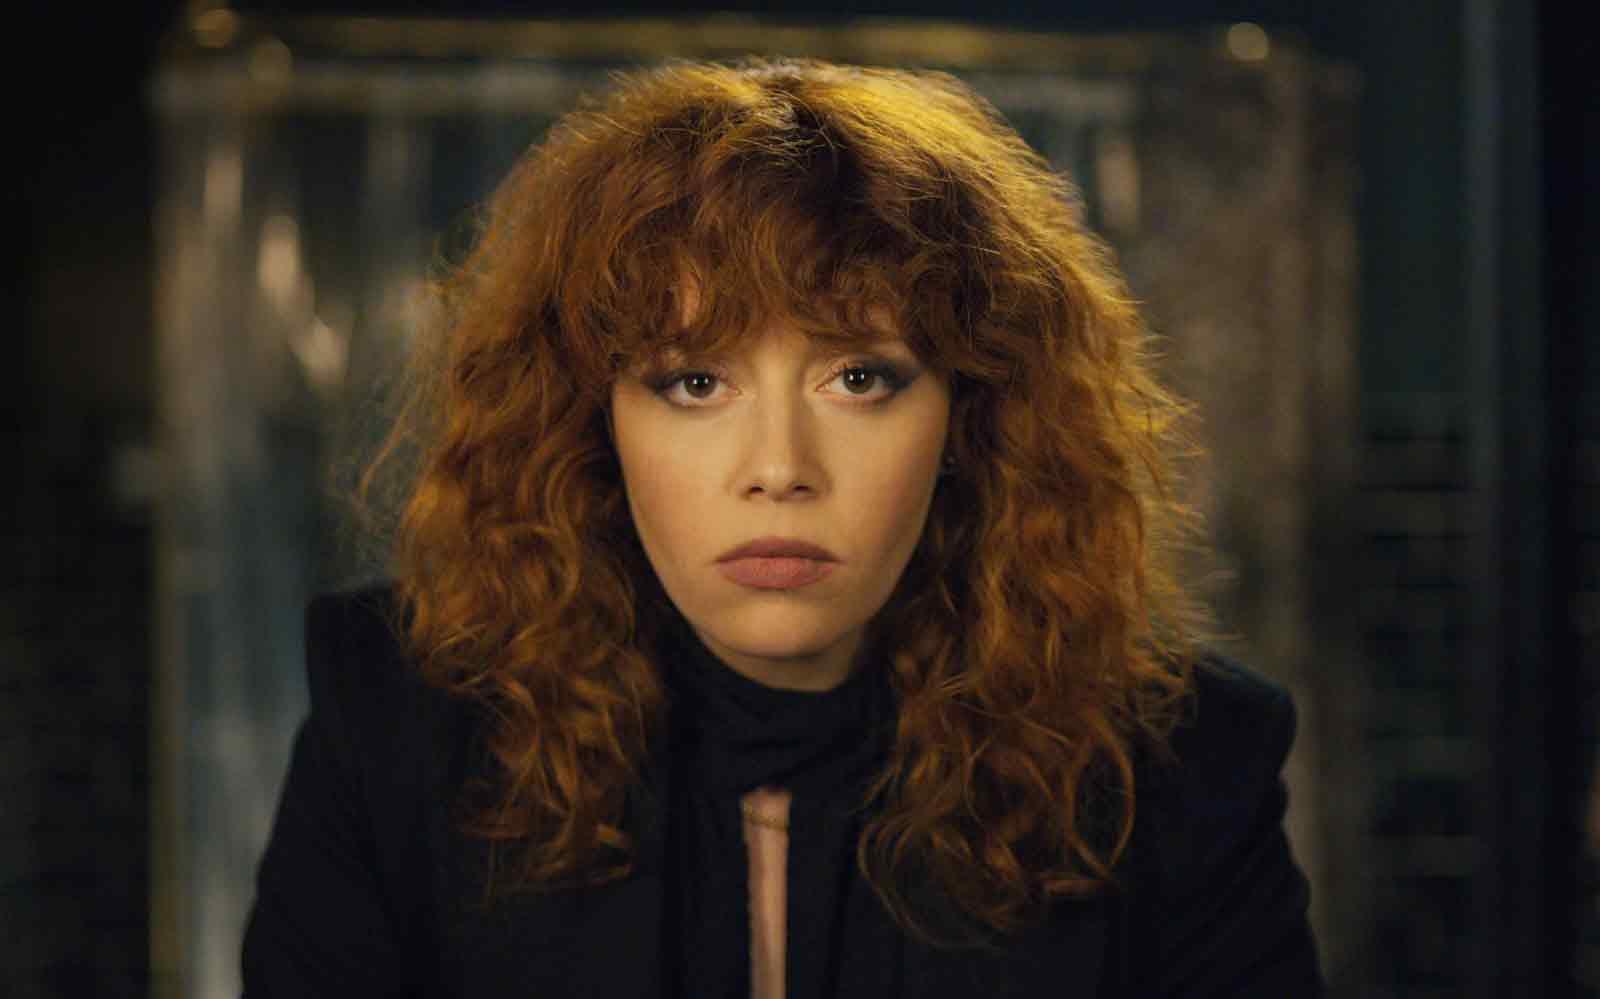 Natasha Lyonne as Nadia Vulvokov in Russian Doll, 2019